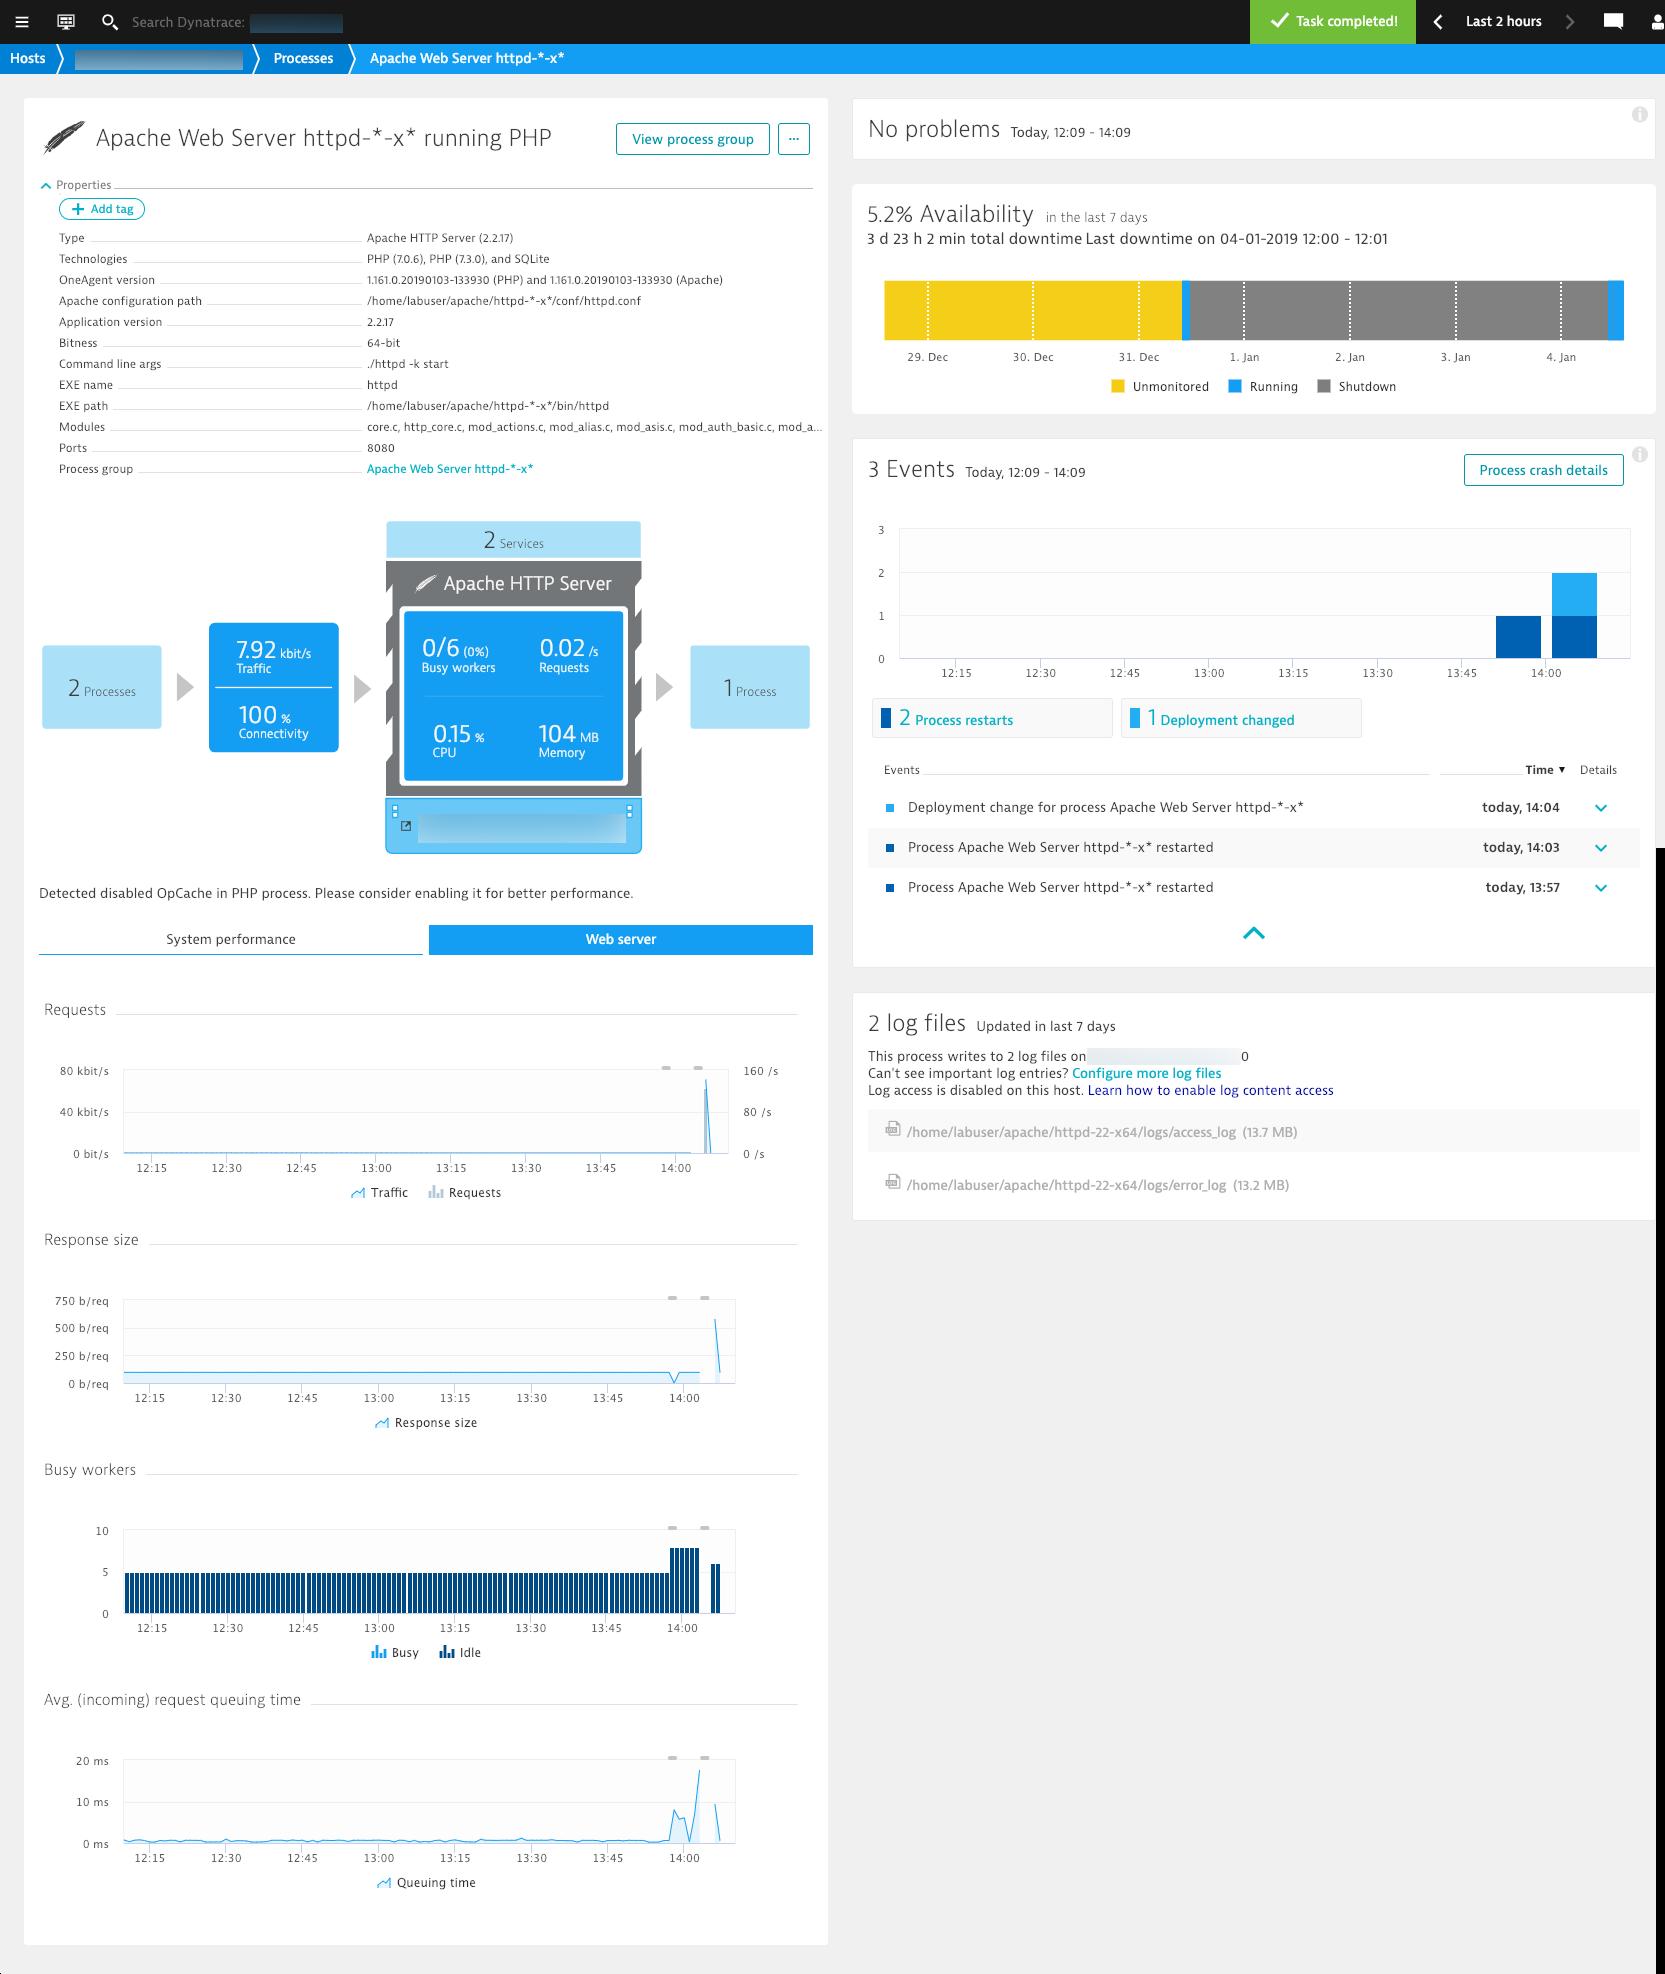 PHP 7.3 on Apache web server process details